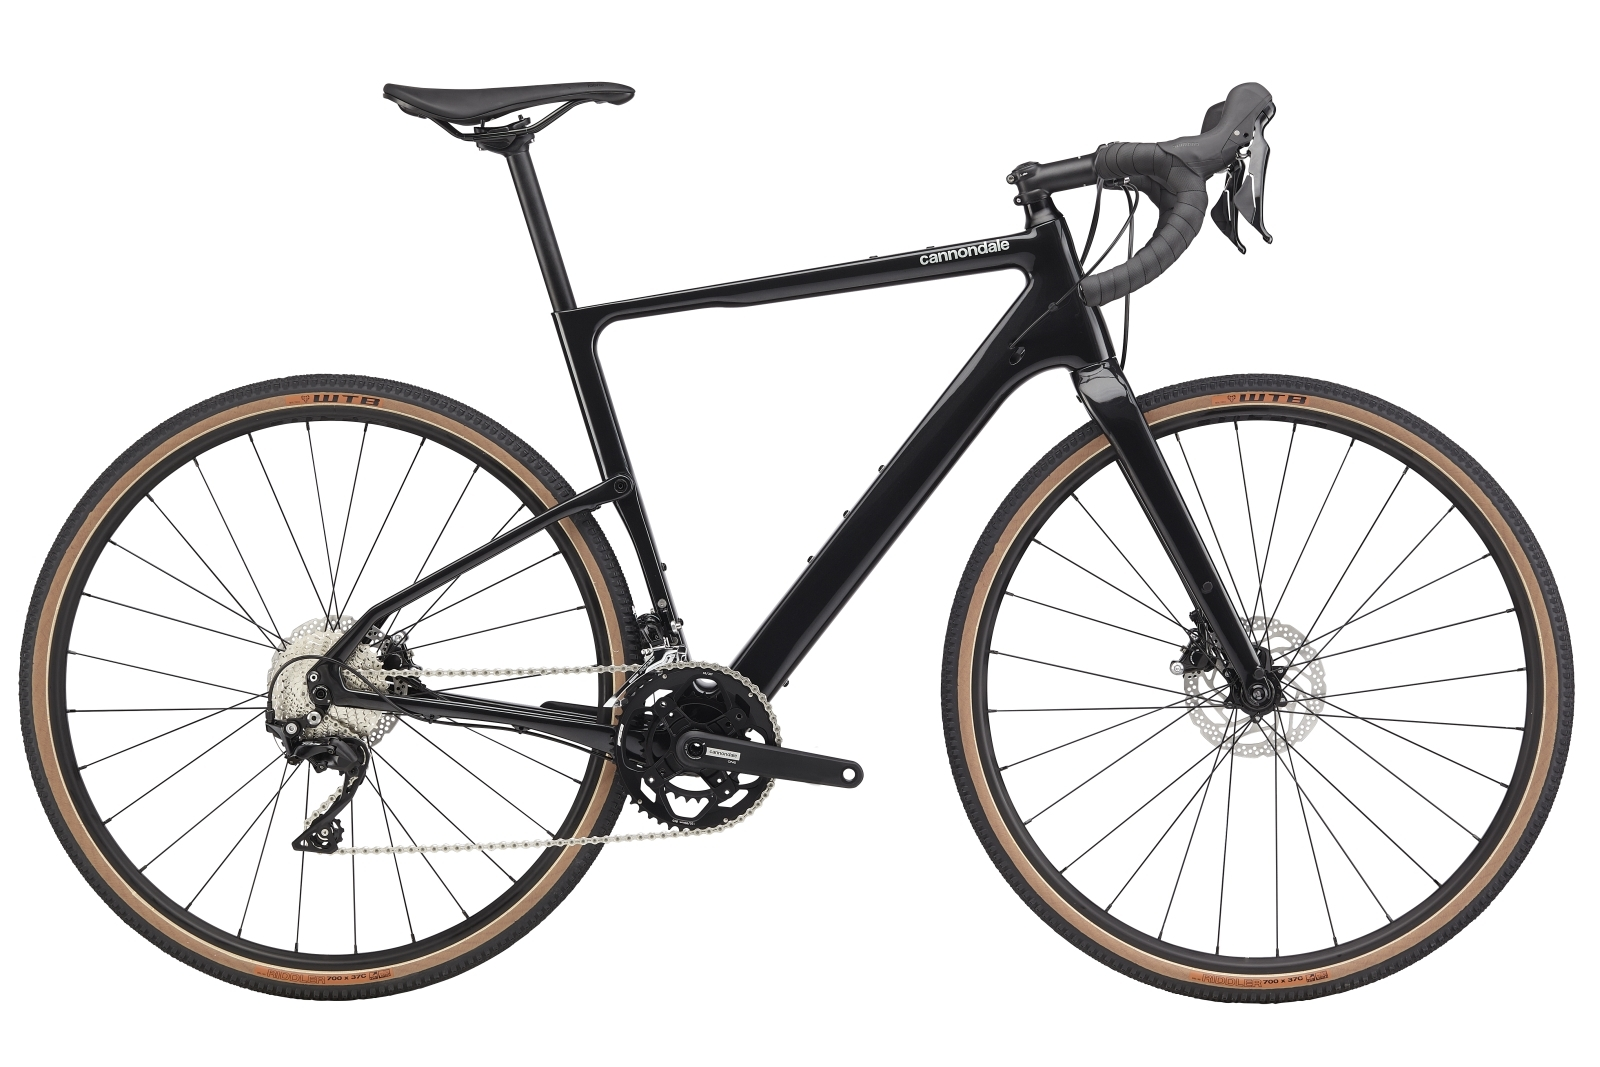 Cannondale Topstone Carbon 105 gravel kerékpár - fekete - XL (2020)